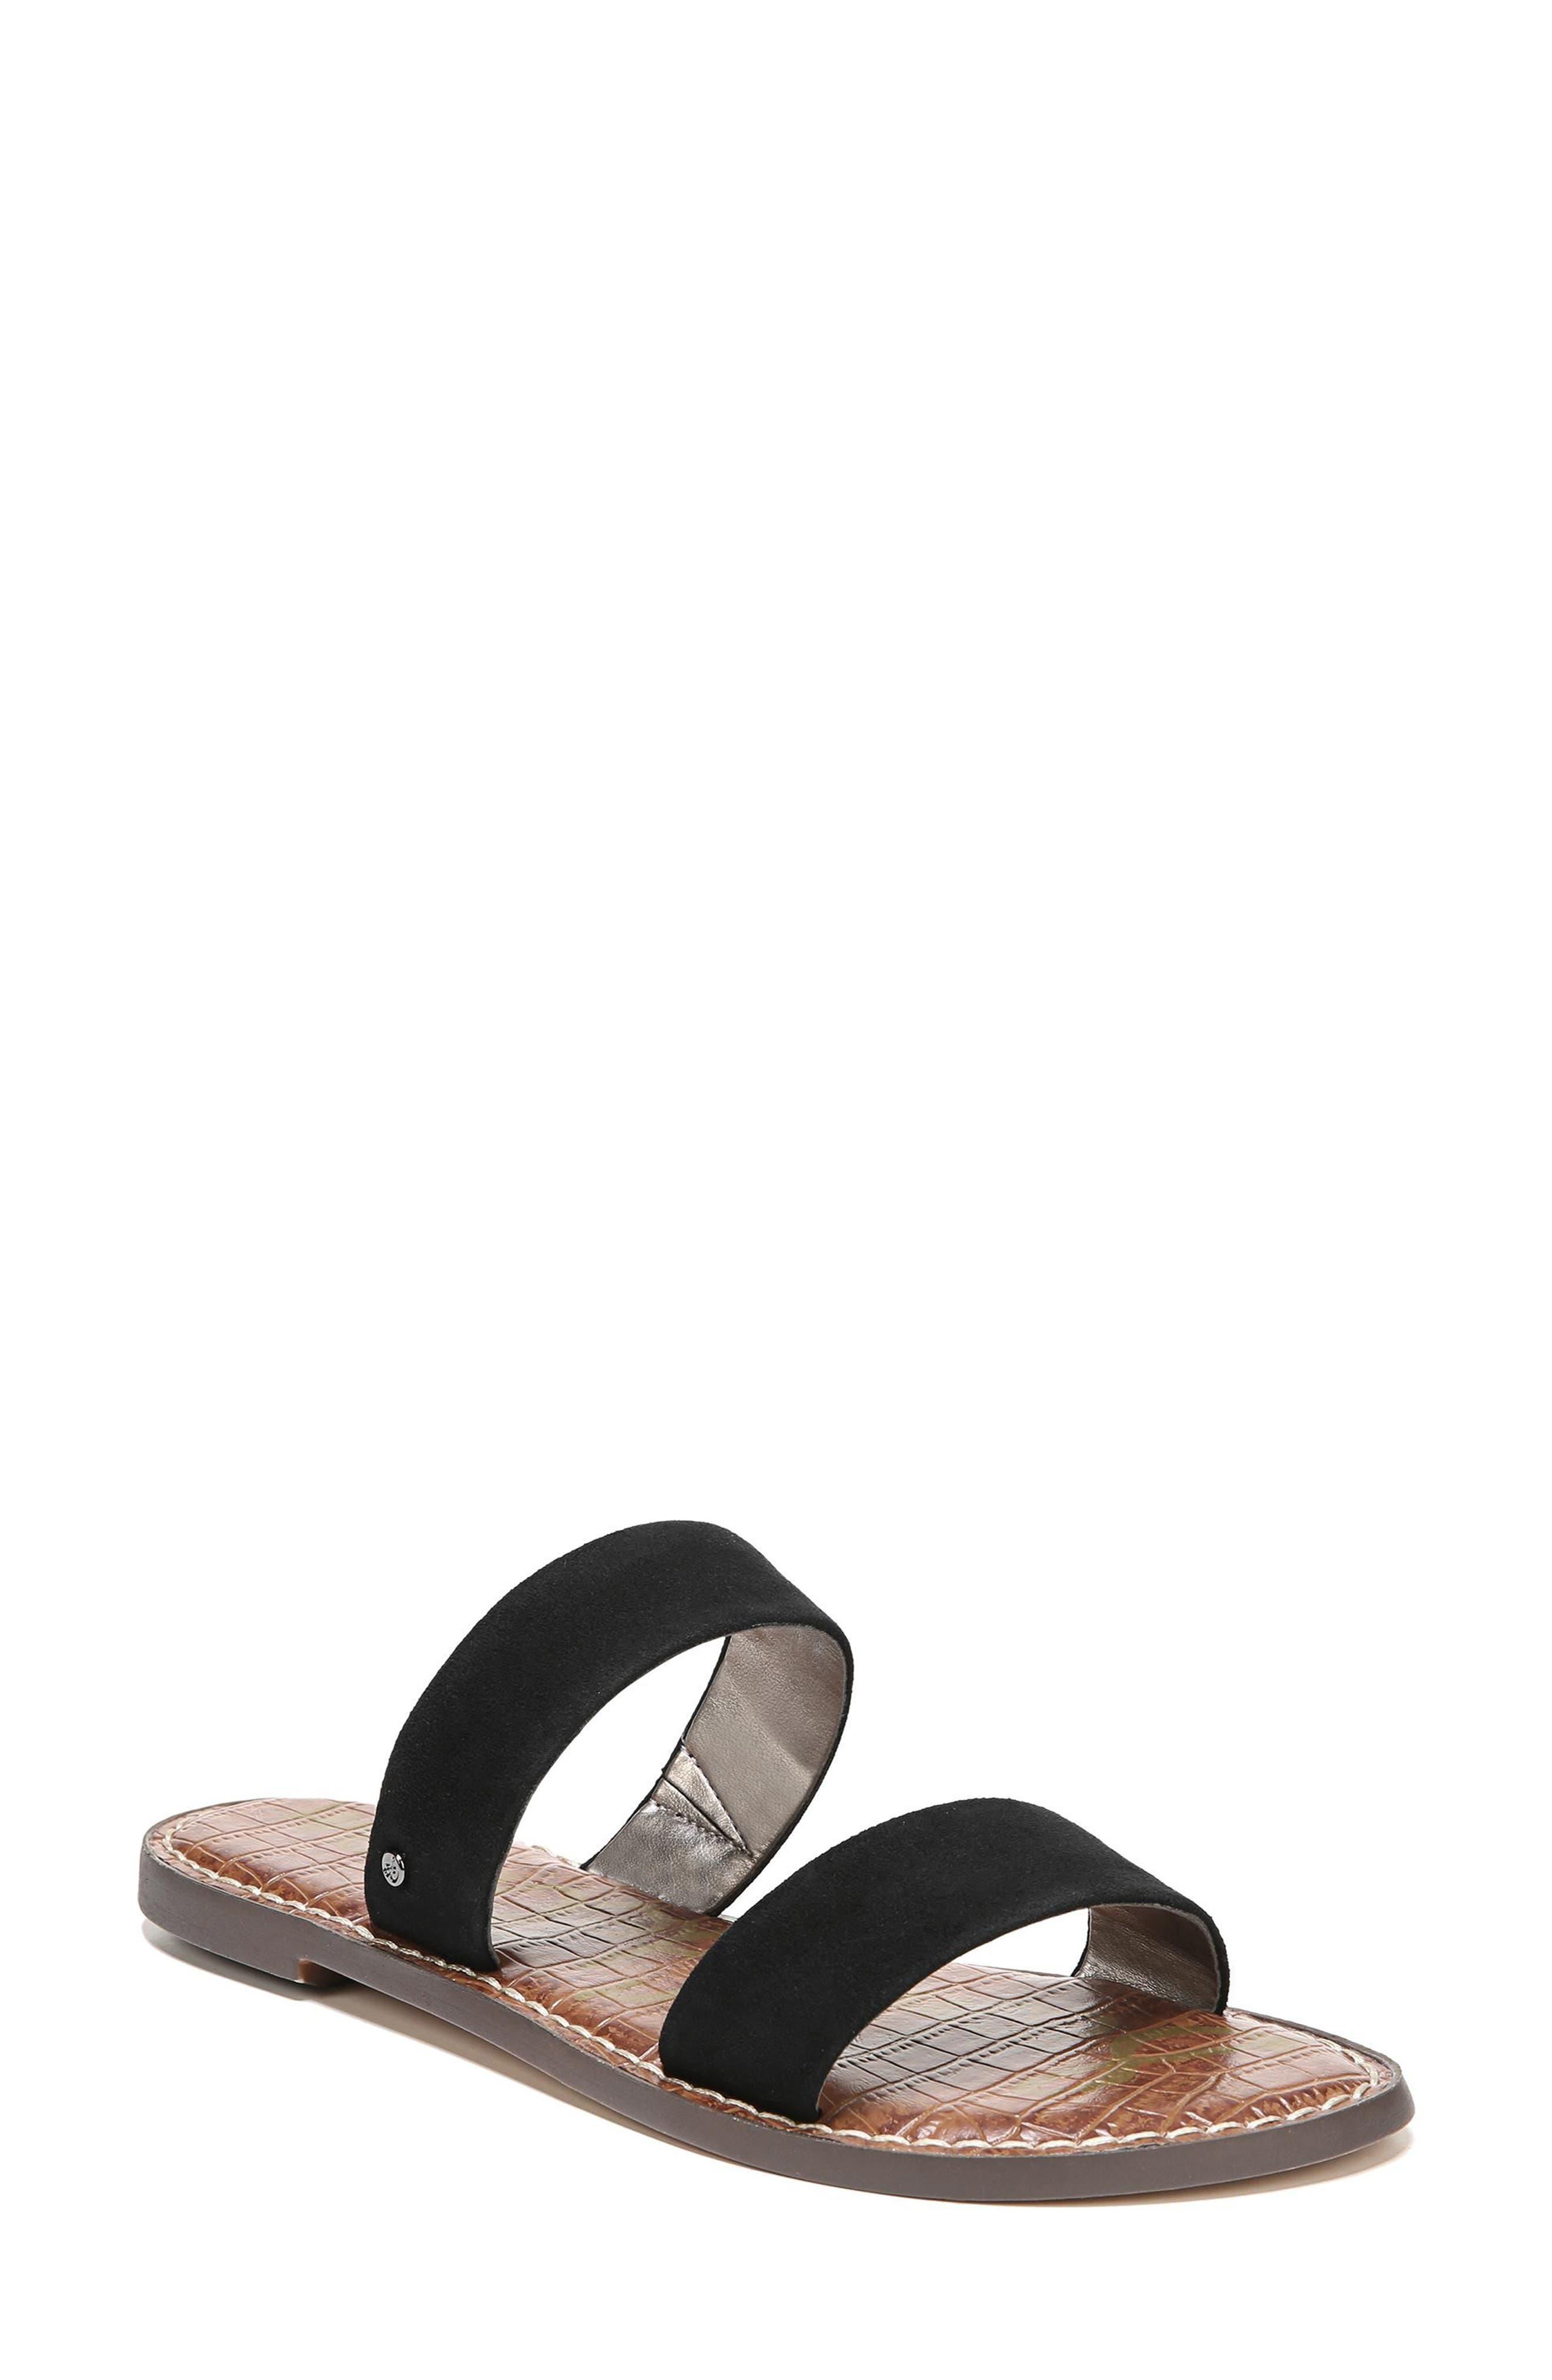 Gala Two Strap Slide Sandal,                             Main thumbnail 1, color,                             BLACK SUEDE